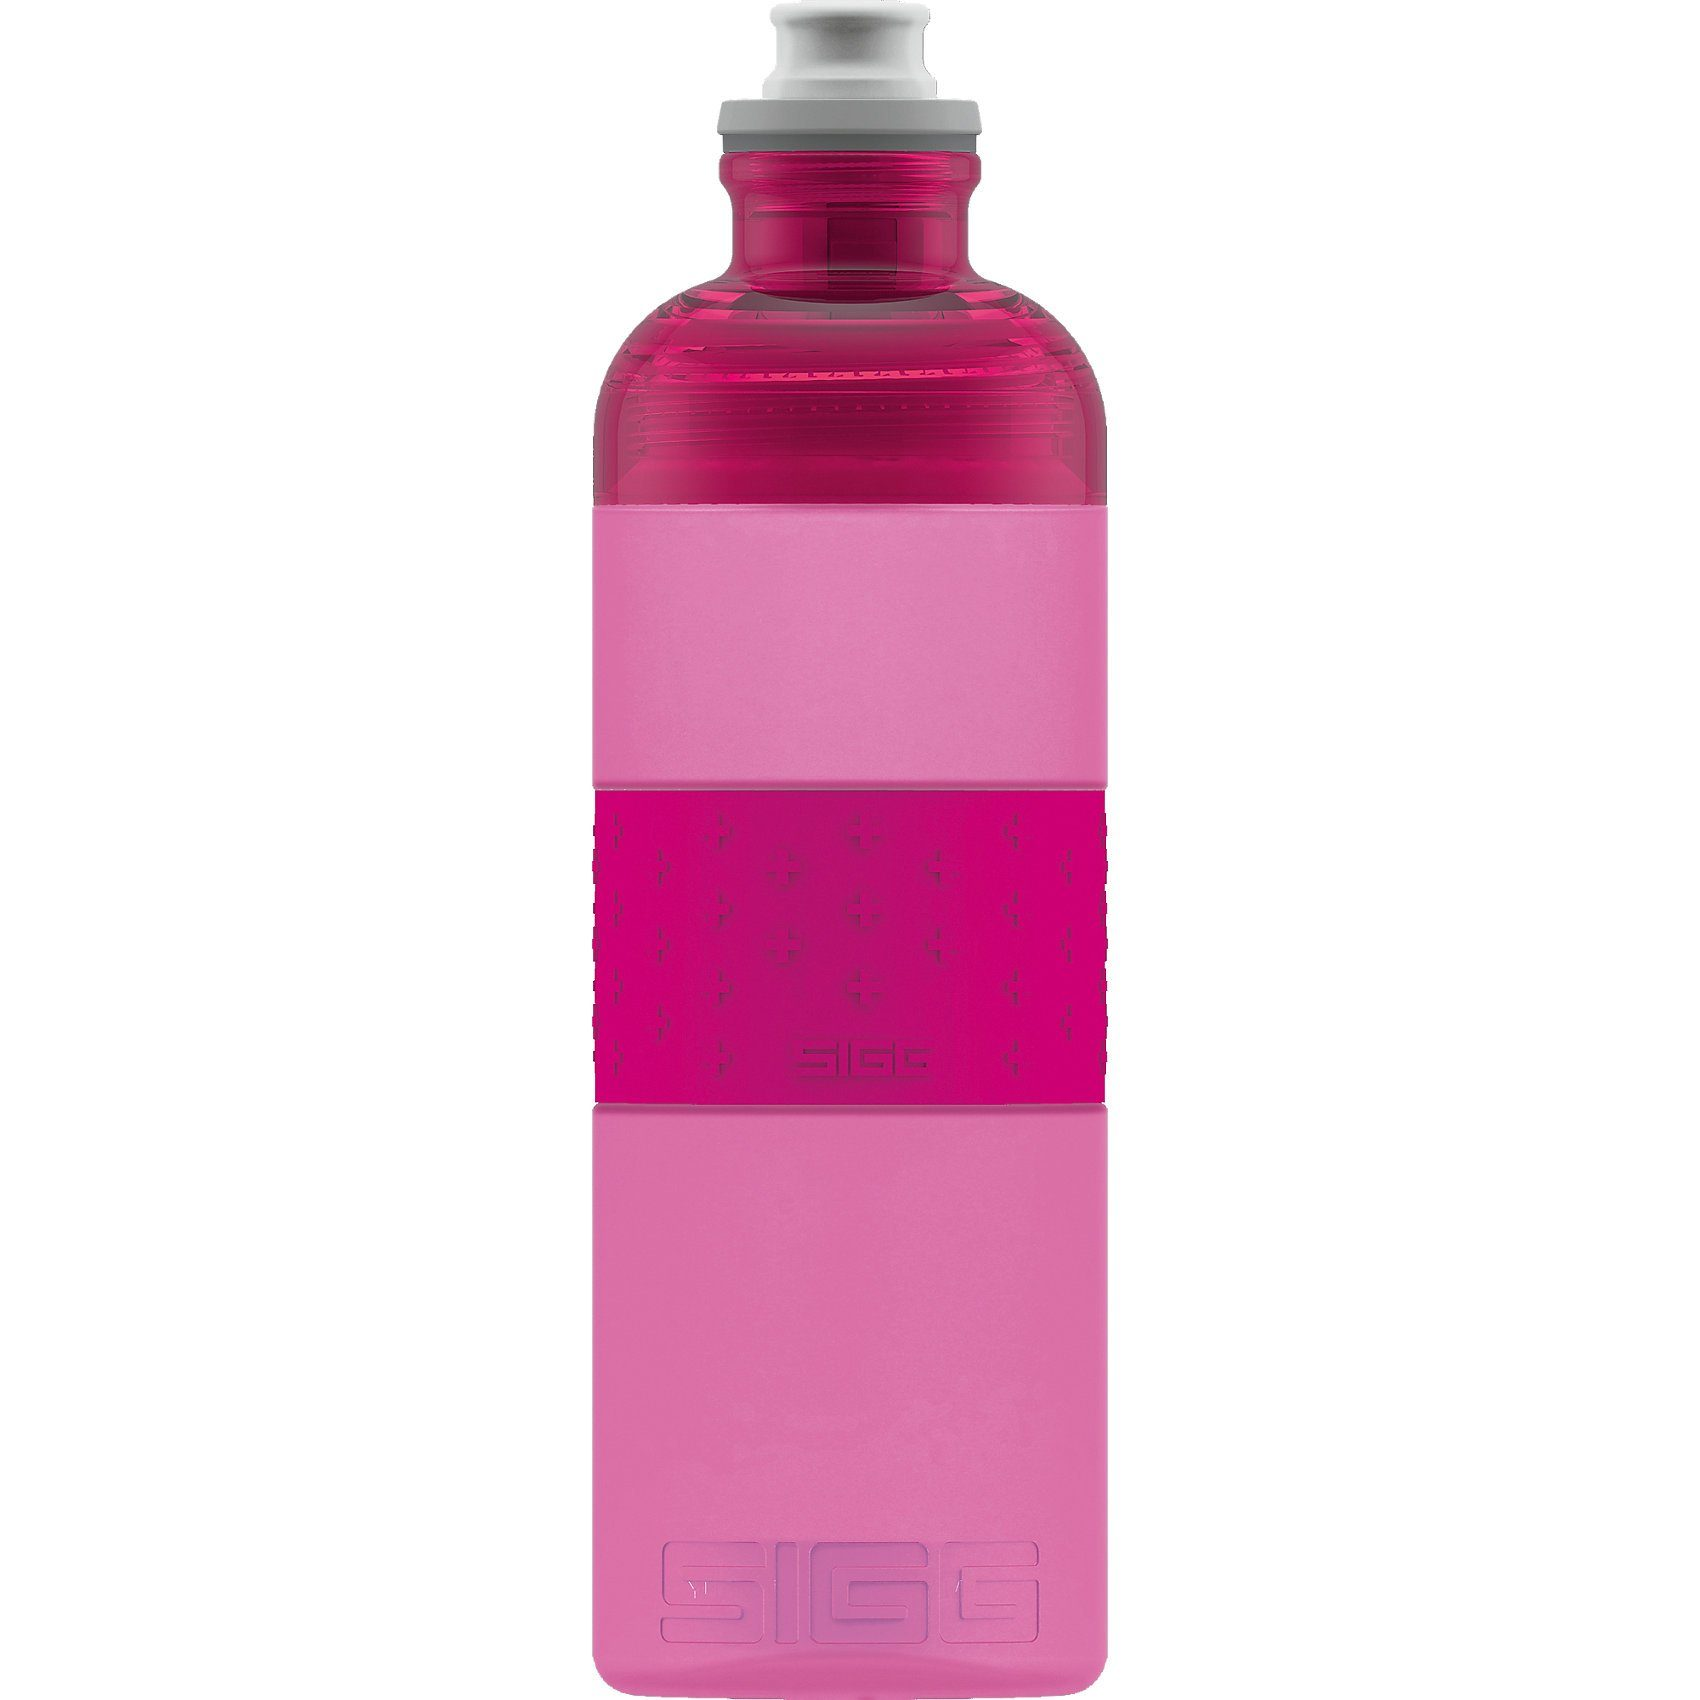 Sigg Trinkflasche HERO squeeze Berry, 600 ml